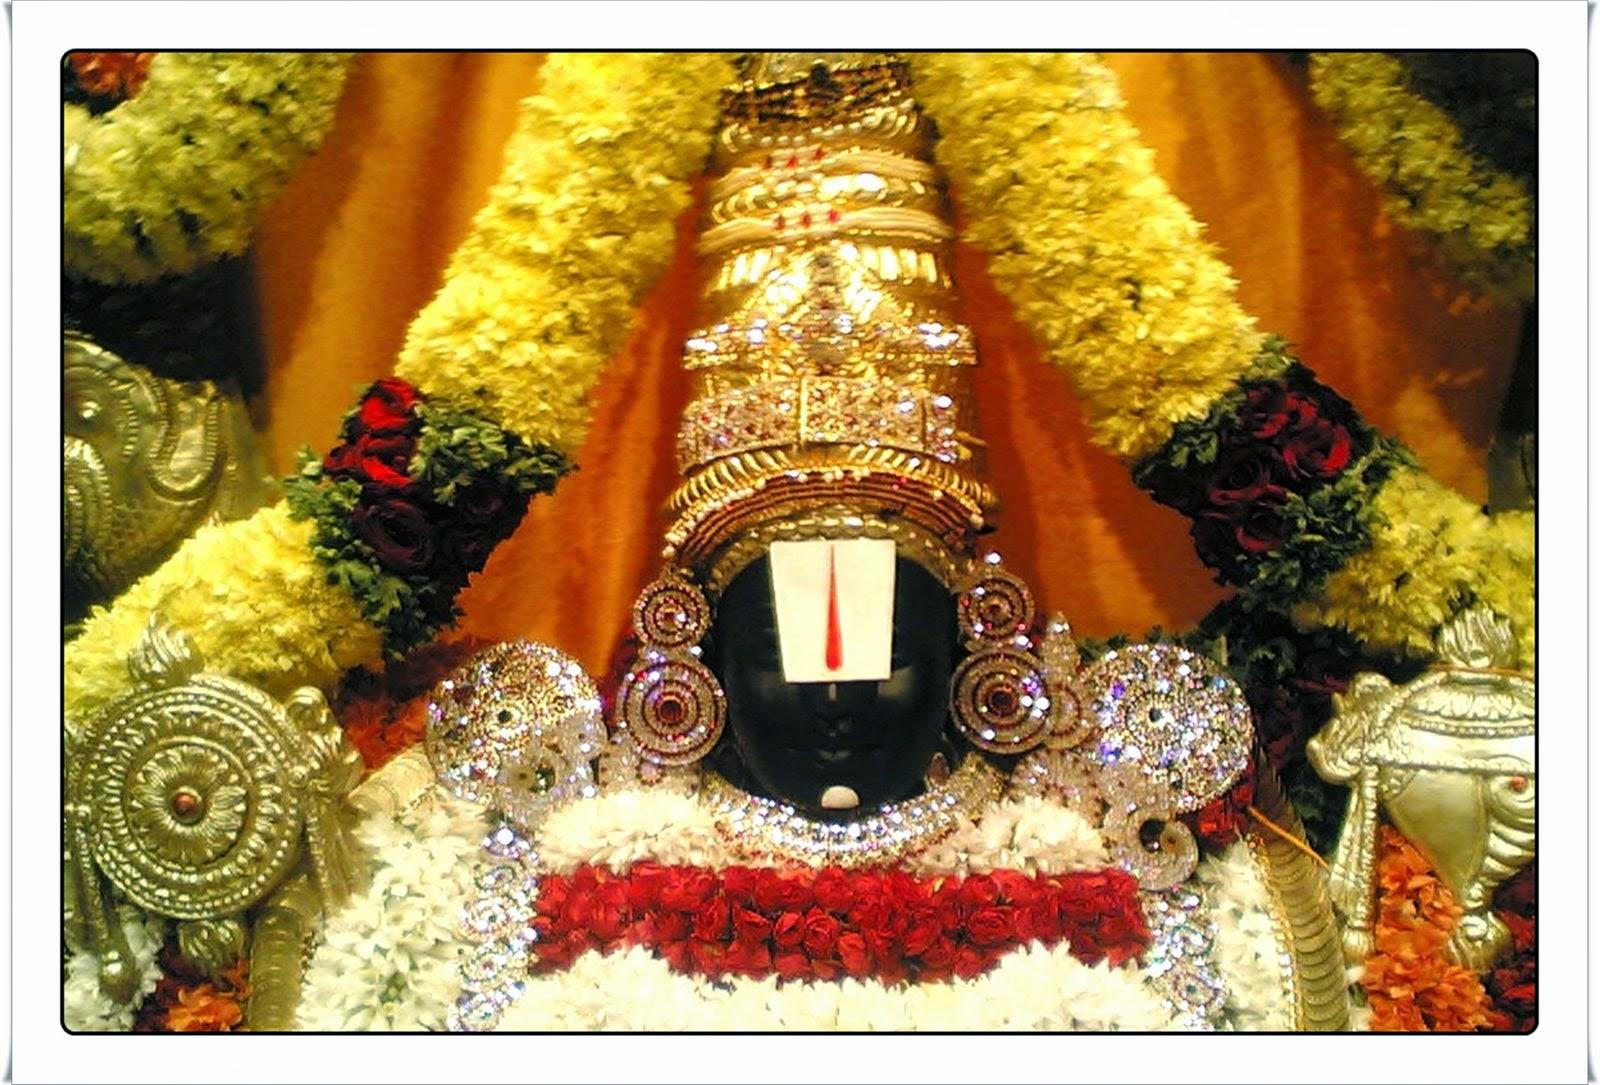 Venkateswara Swamy Hd Wallpapers Lord Balaji Tirumala Venkateswara Swamy Wallpapers